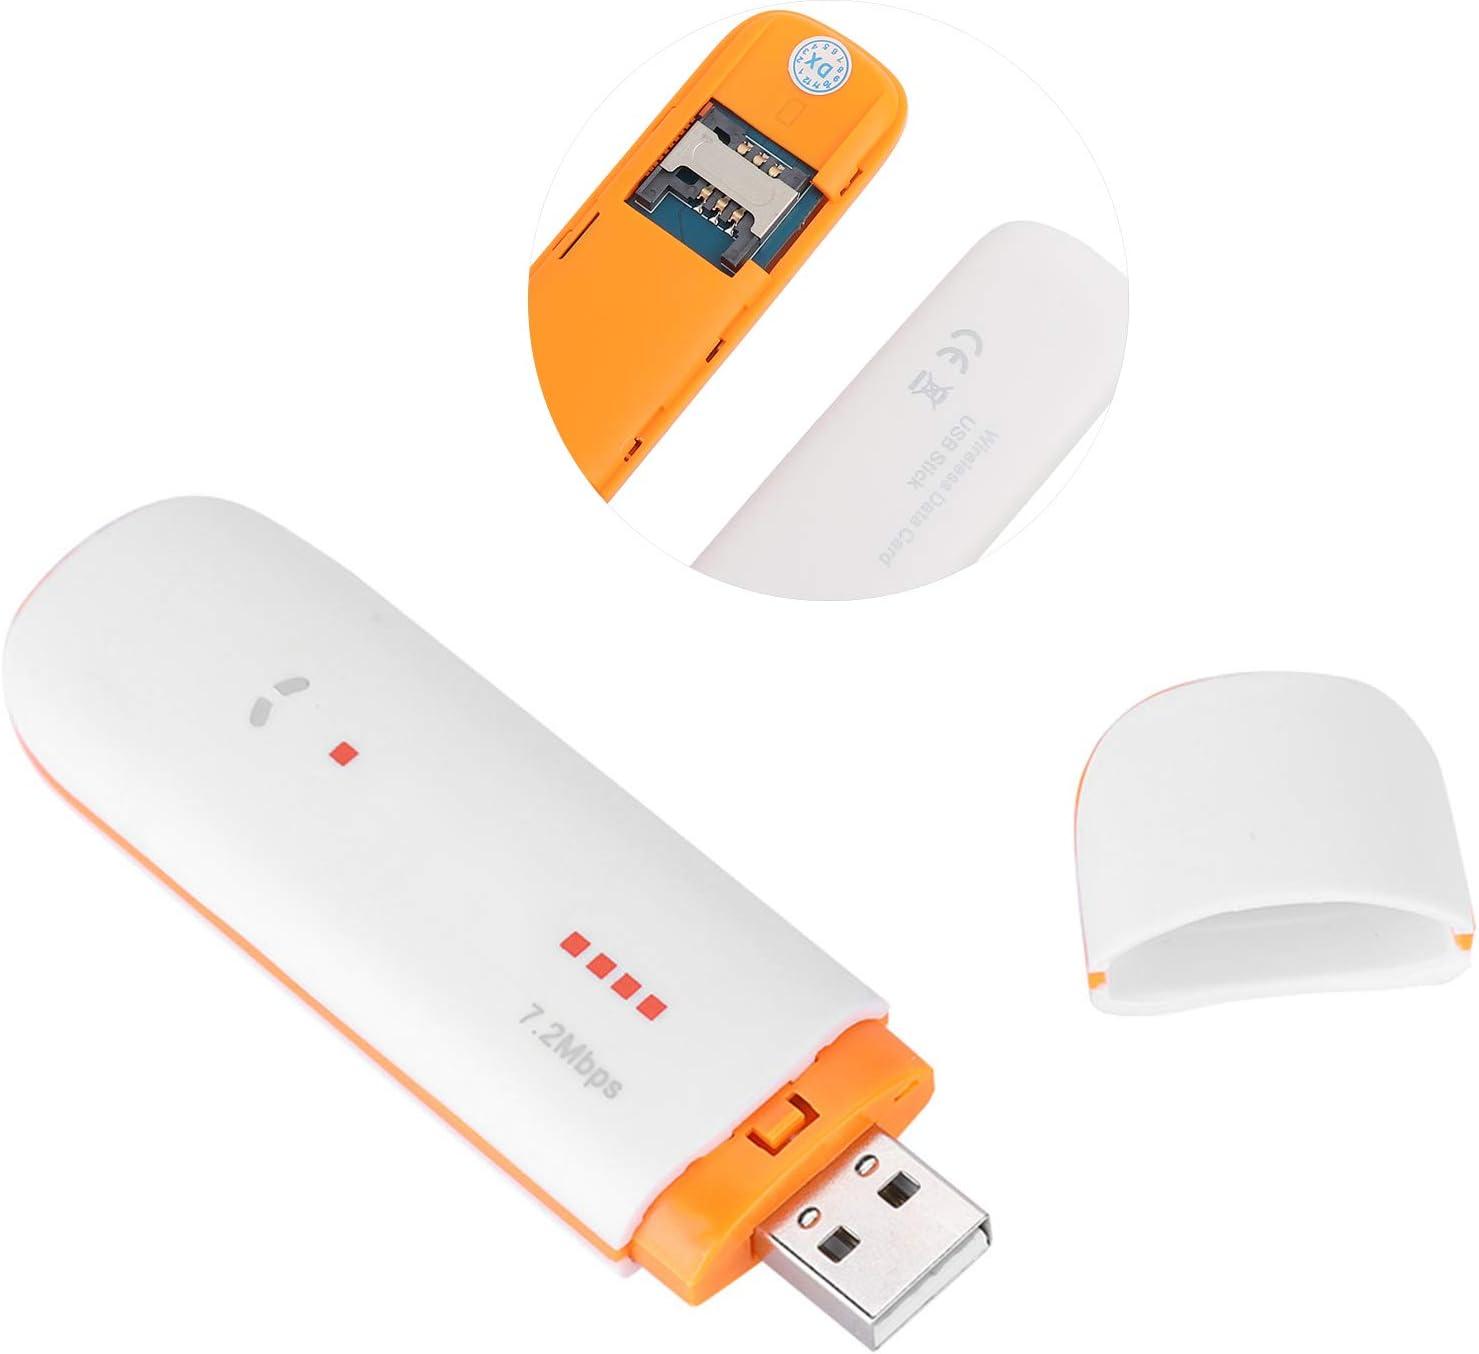 Dongle USB, Tarjeta de Red 3G SIM Dongle USB Módem 4G LTE para Windows 2000/2003/XP/vista/7/8/10/MAC/Linux/Android.